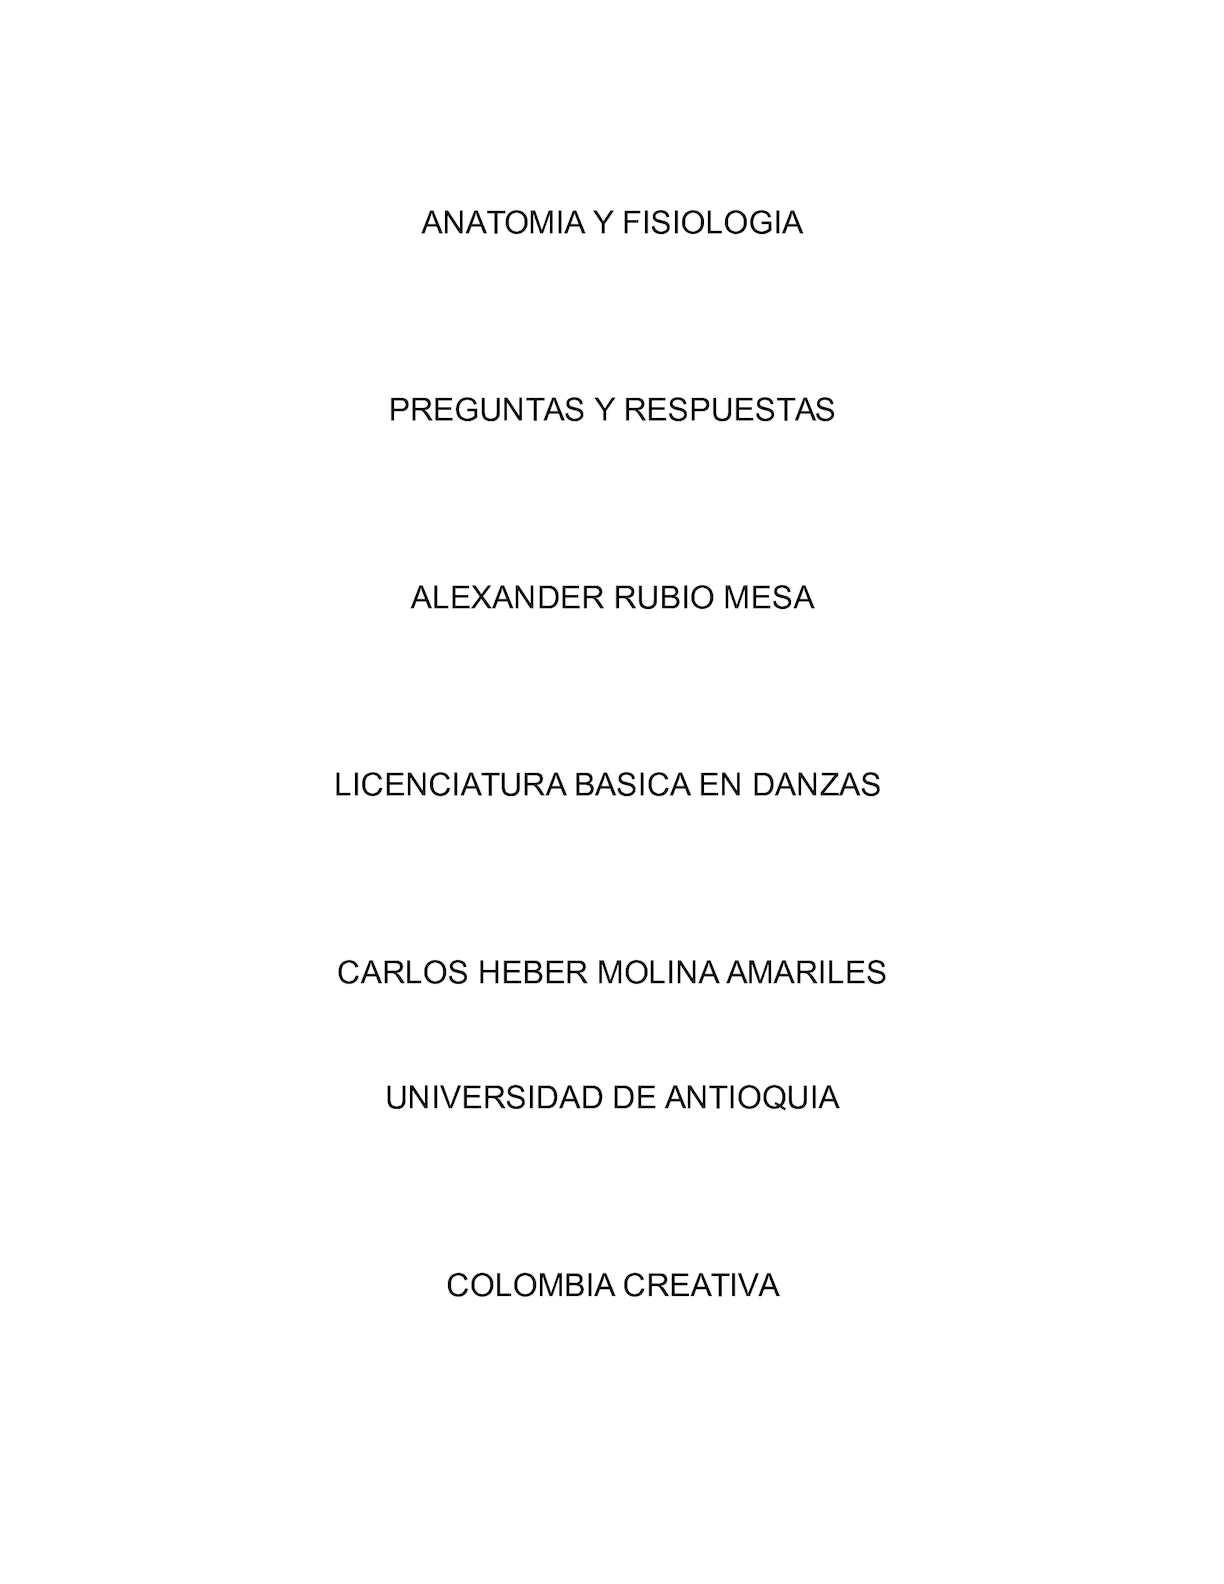 Calaméo - ANATOMIA Y FISIOLOGIA